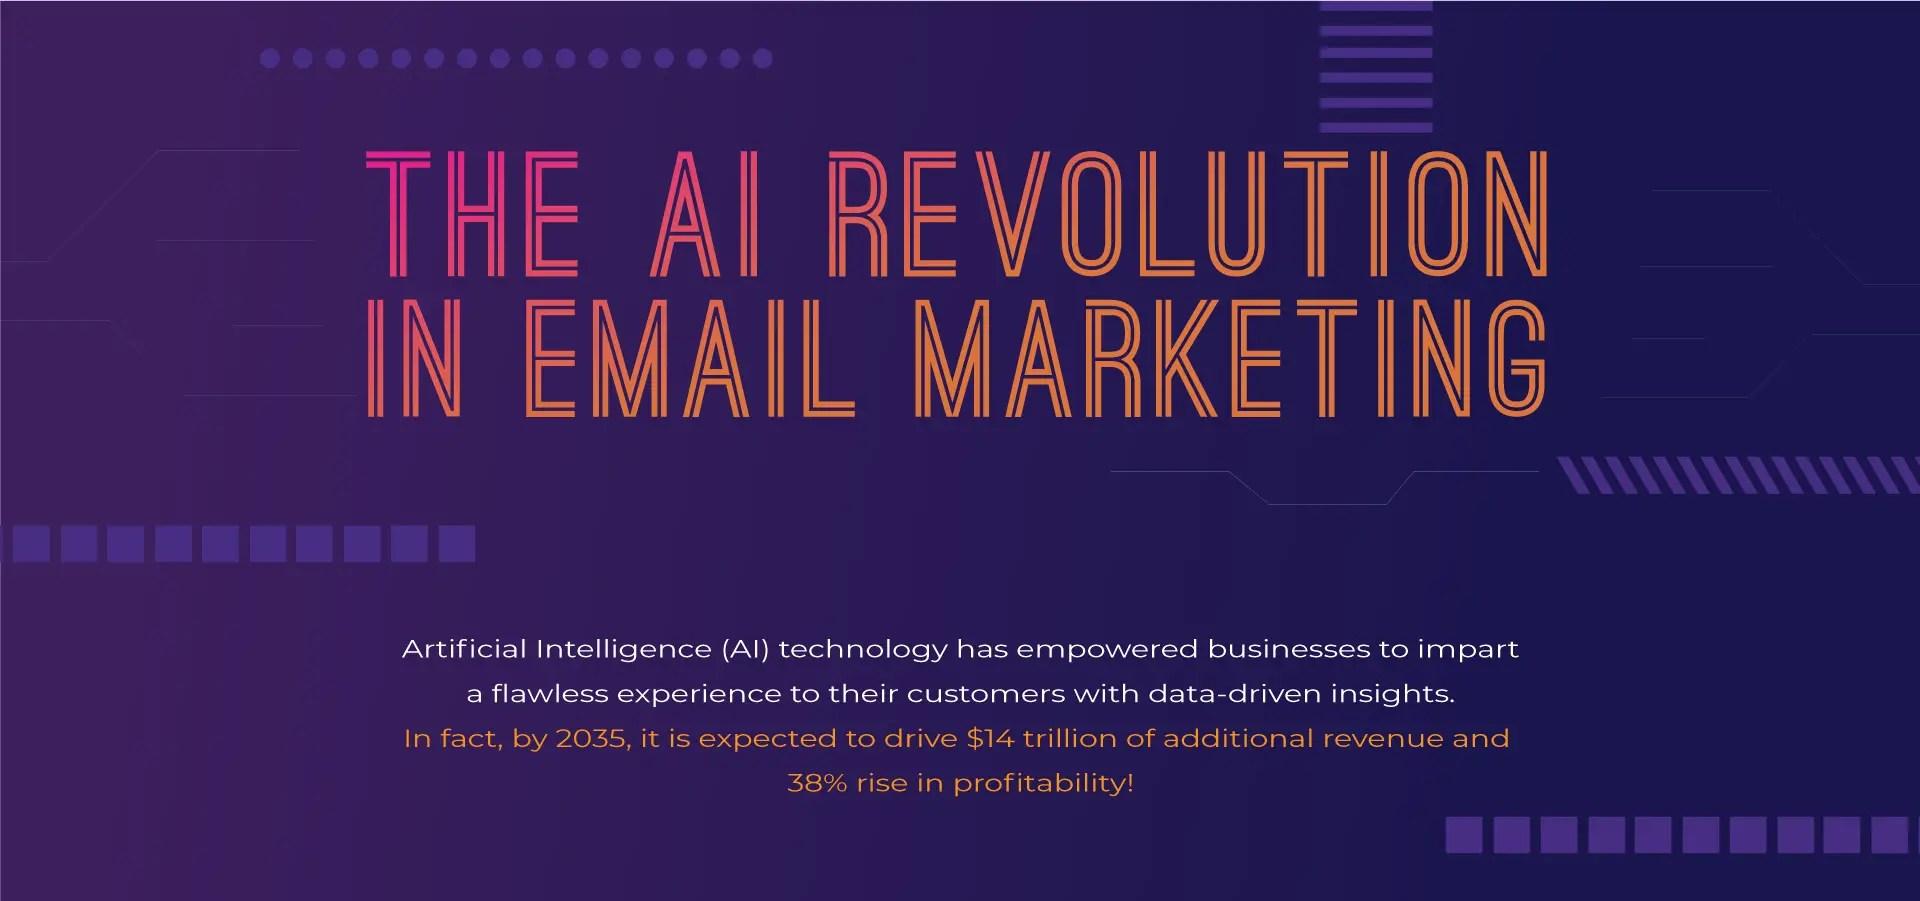 7 Ways that AI is Revolutionizing Email Marketing